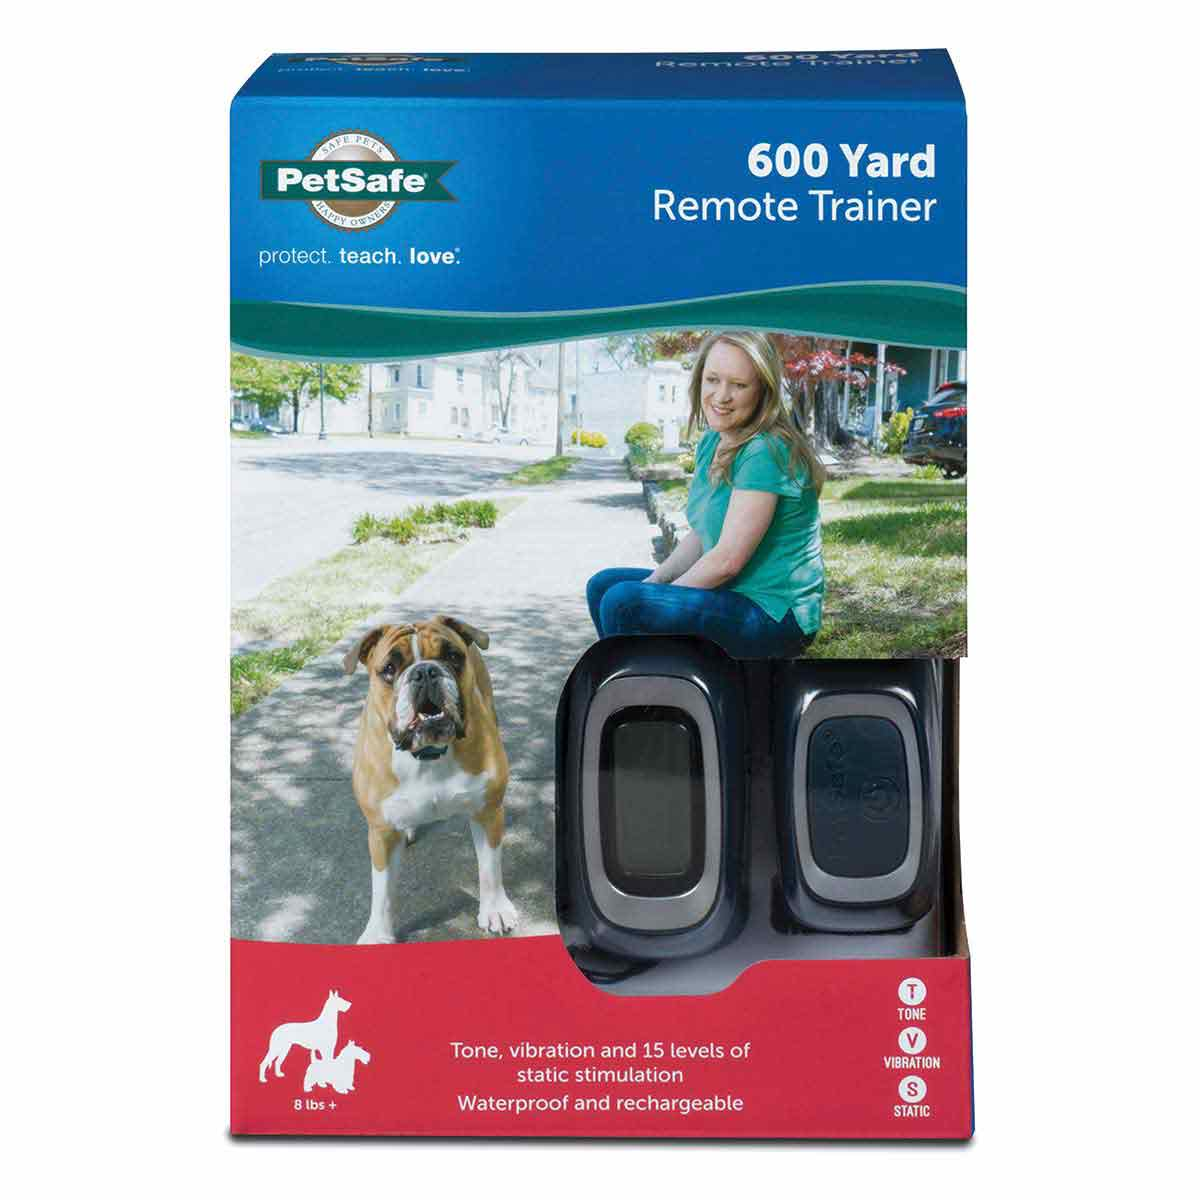 600 Yard PetSafe Yard Remote Trainer Pet Collar available at Ryan's Pet Supplies